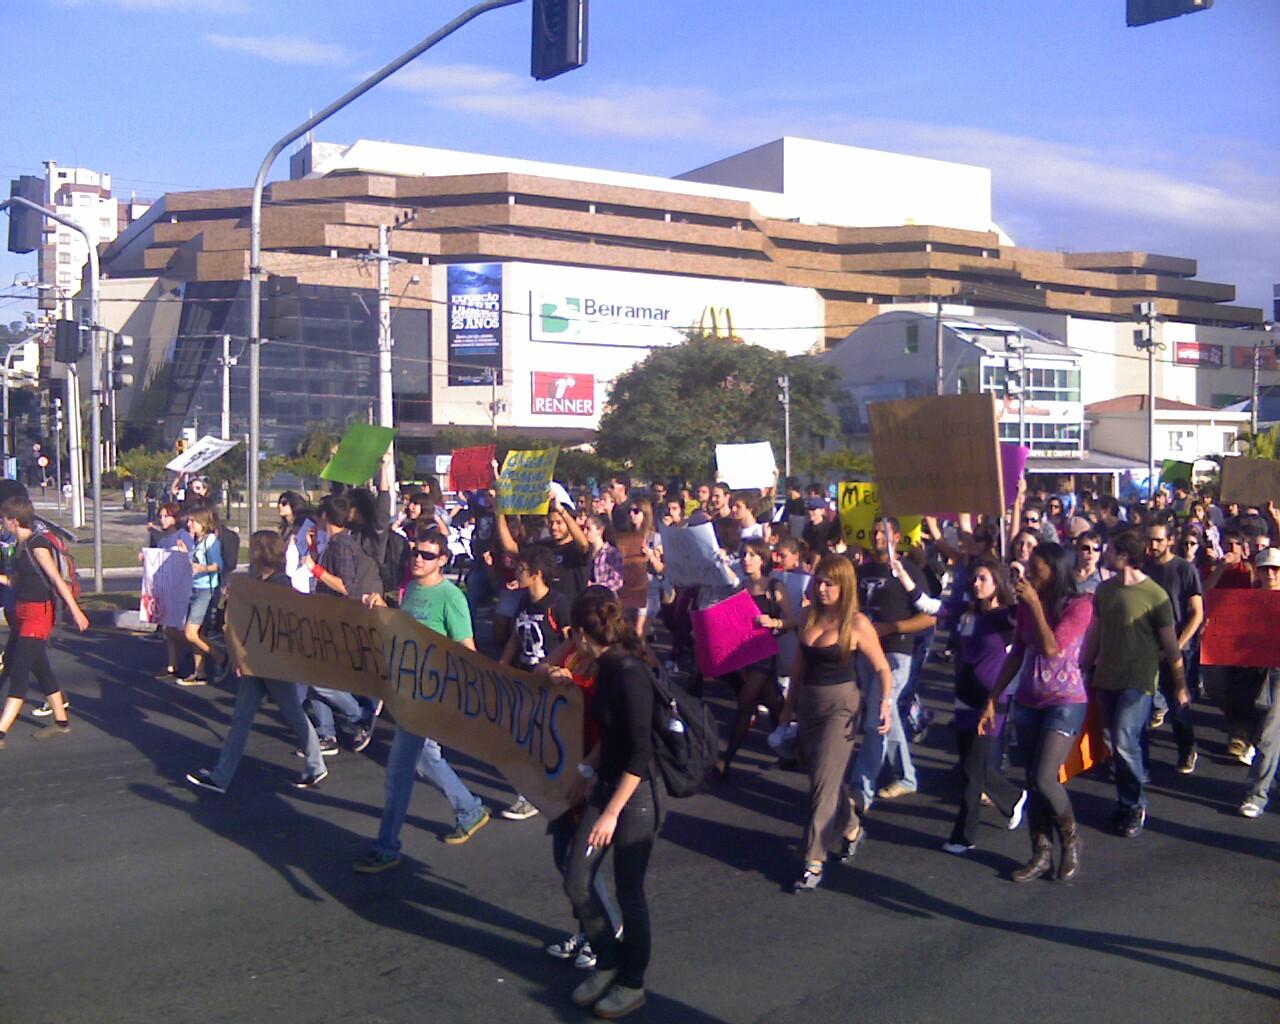 #MarchadaLiberdade em #Floripa #andando